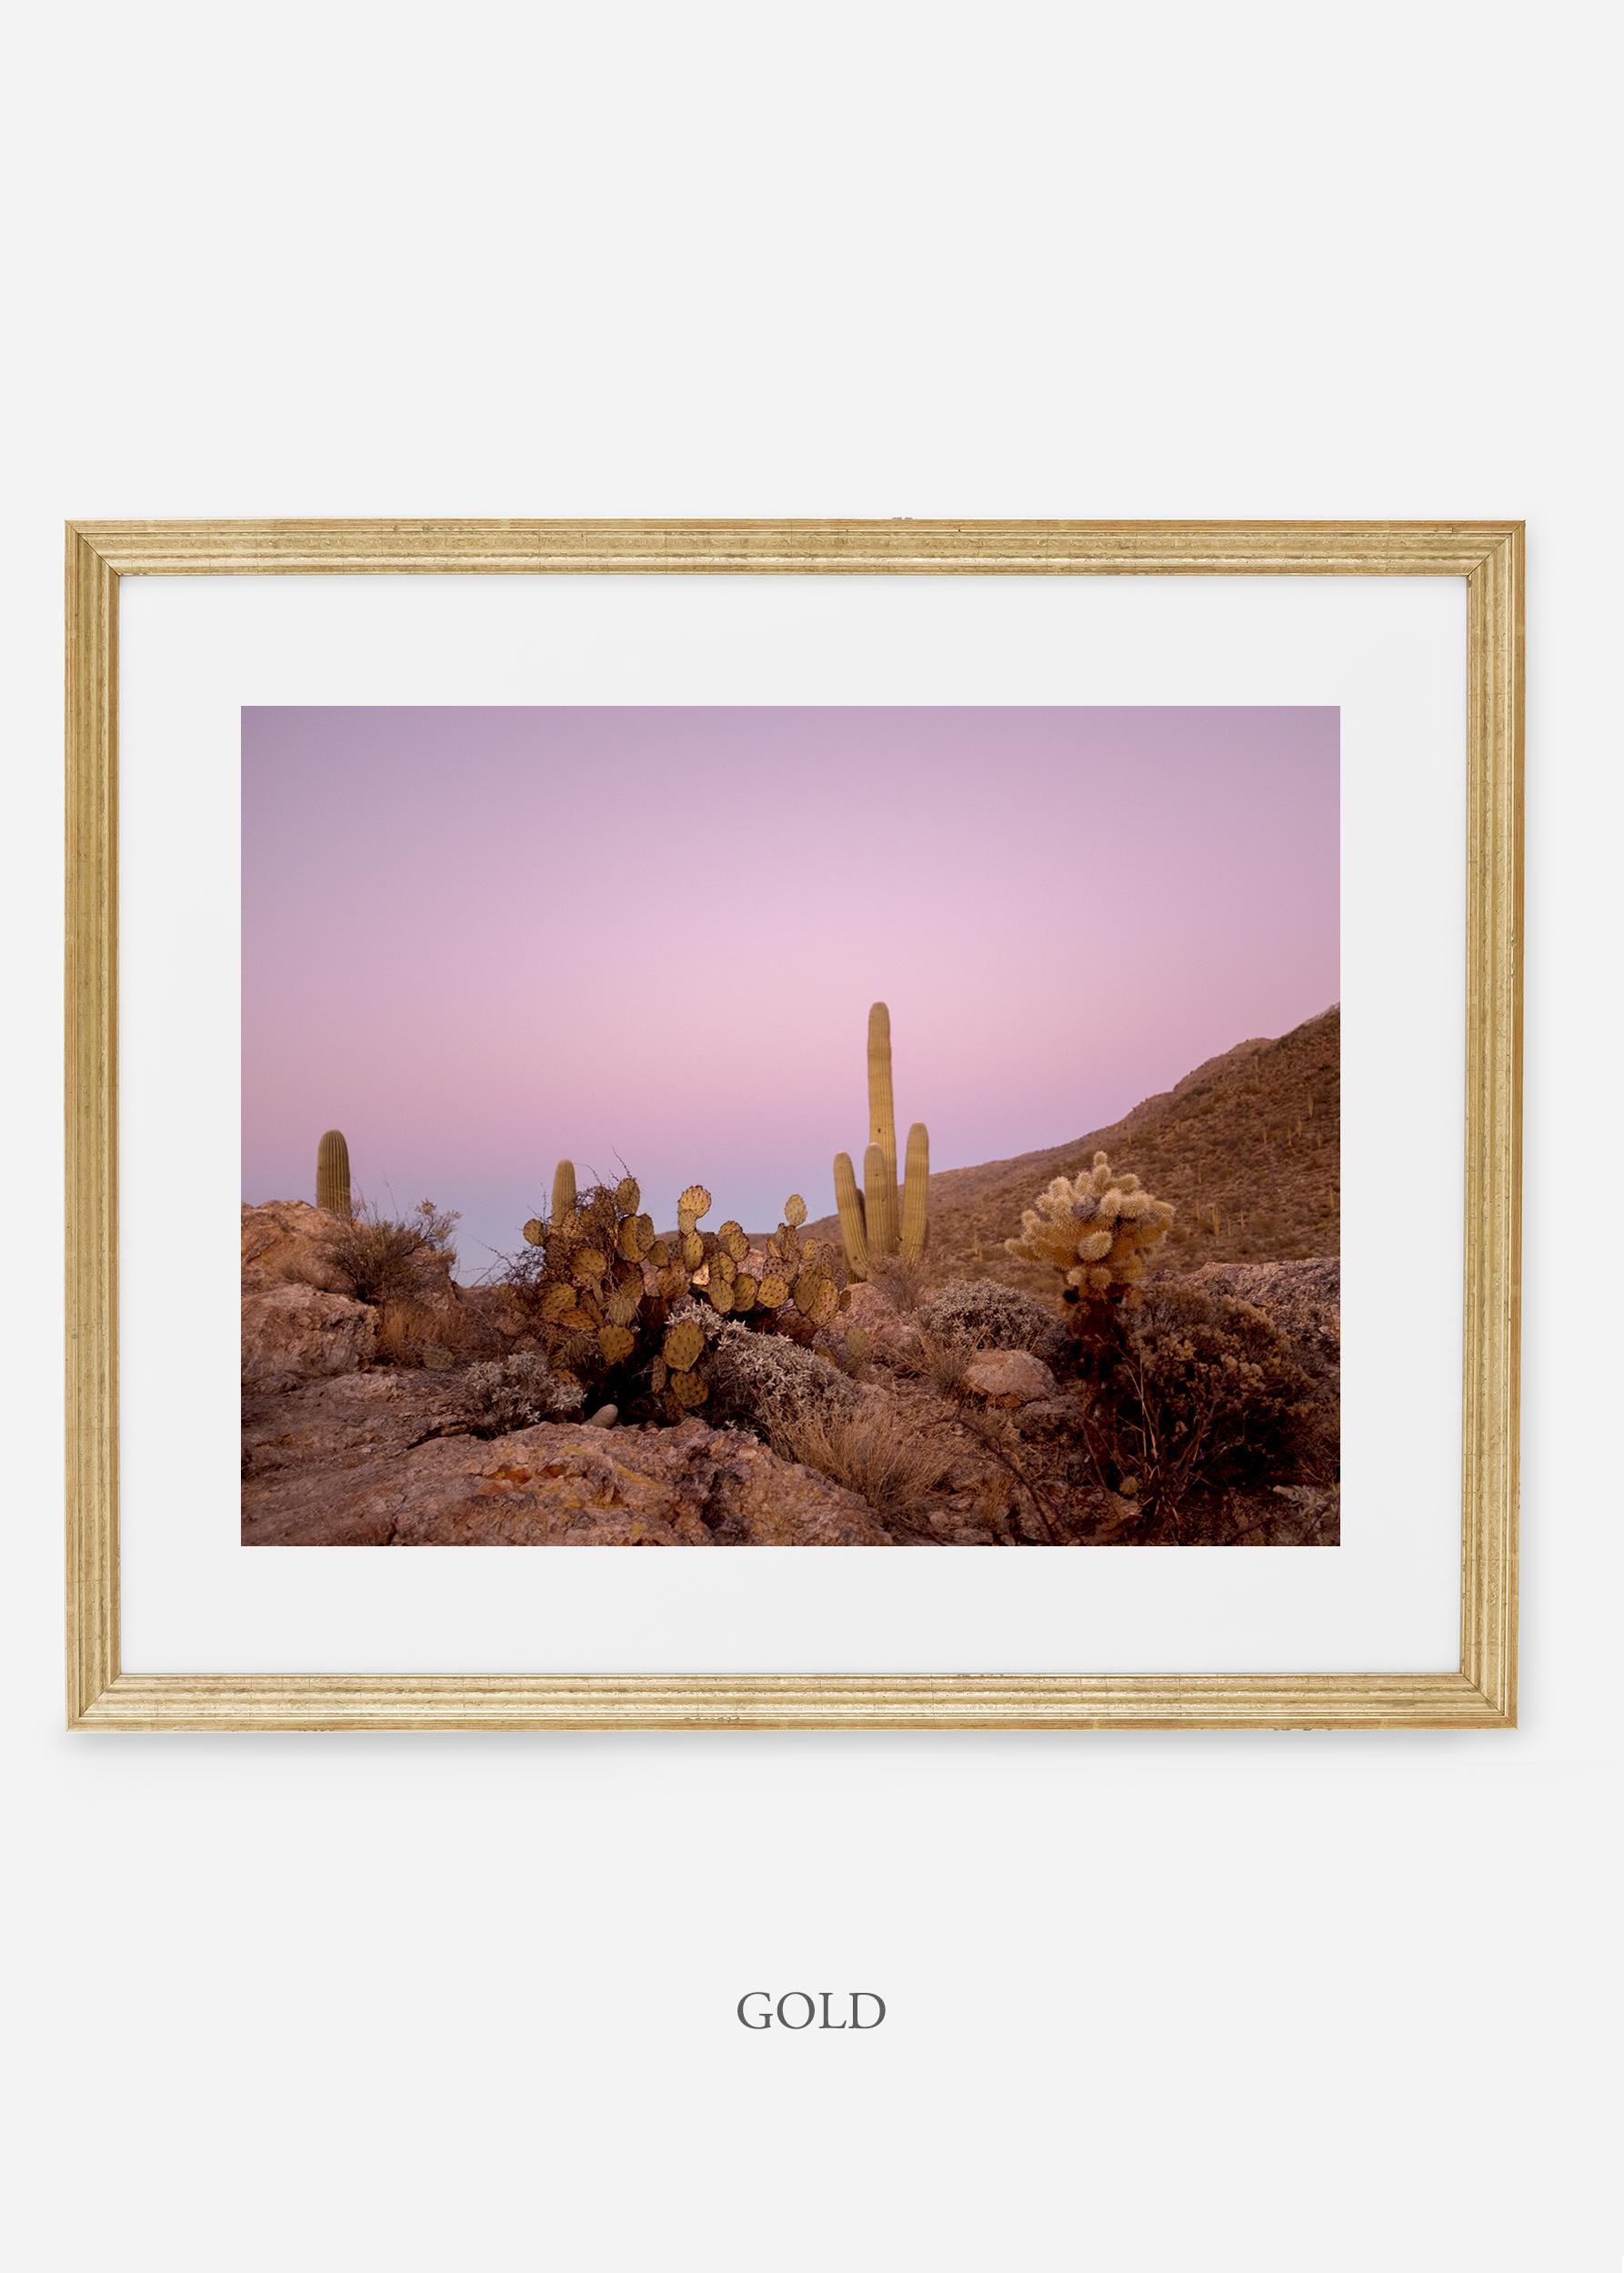 goldframe-saguaroNo.9-wildercalifornia-art-wallart-cactusprint-homedecor-prints-arizona-botanical-artwork-interiordesign.jpg